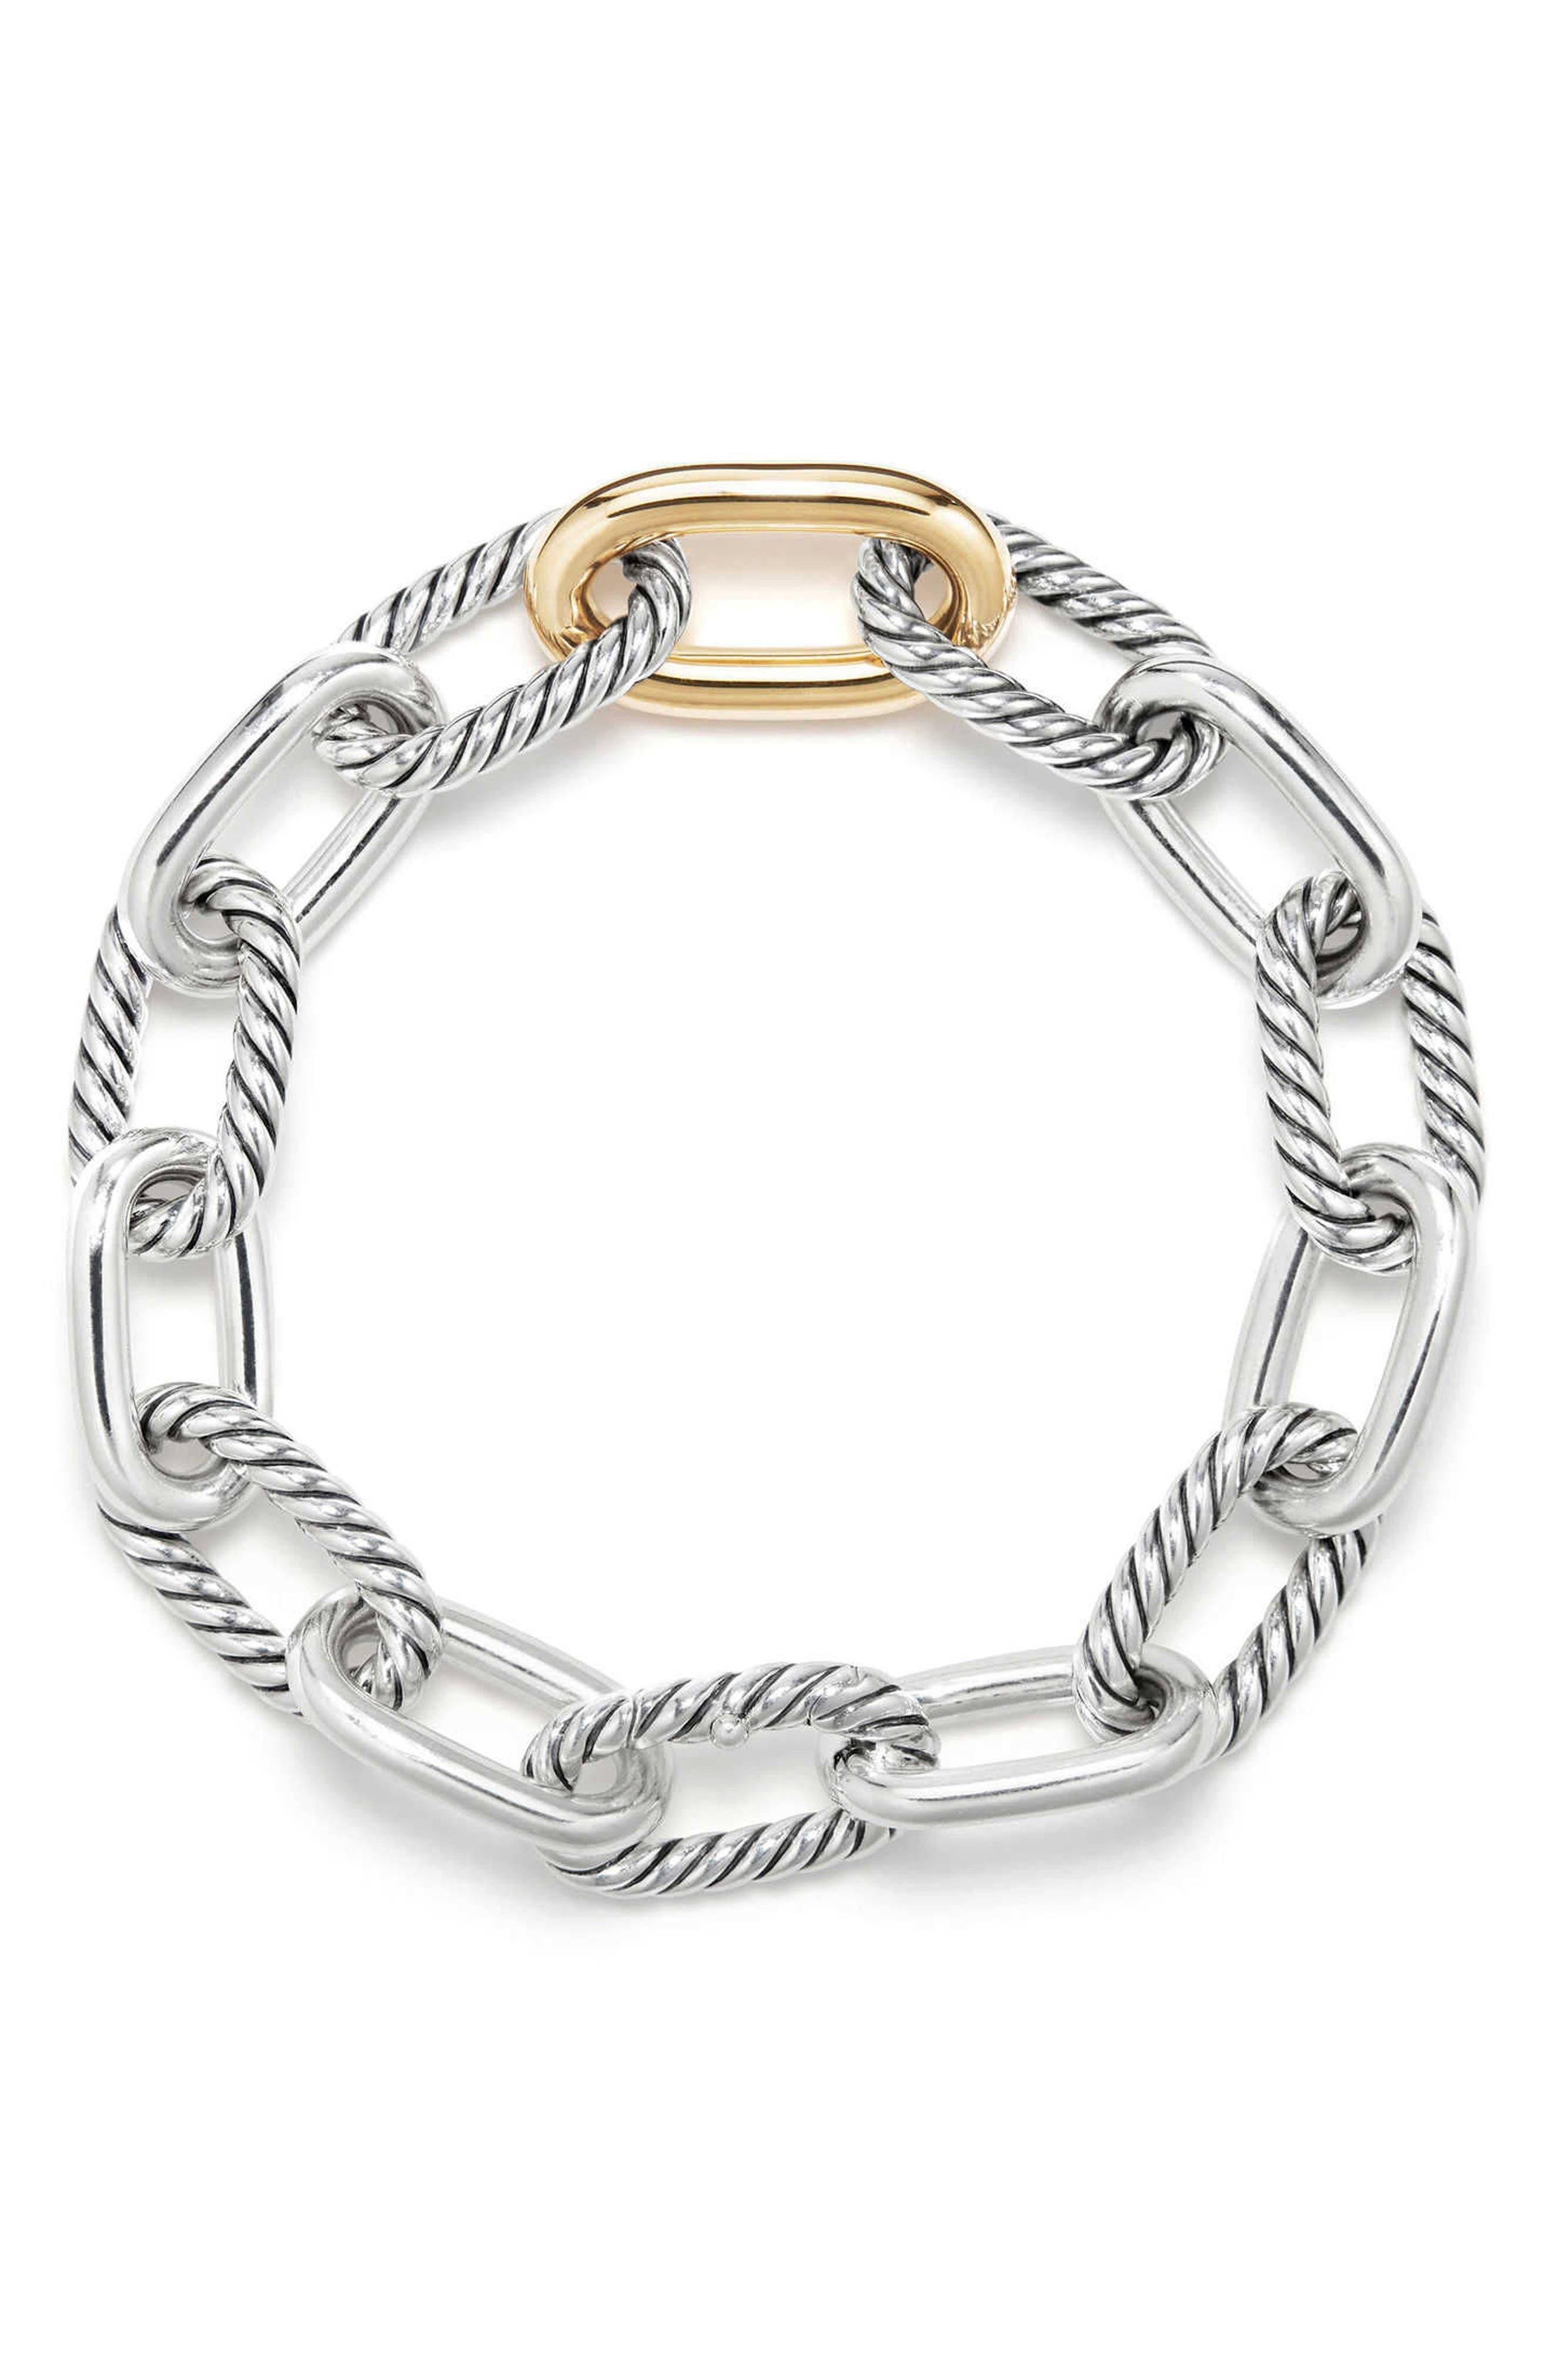 DAVID YURMAN, DY Madison Chain Medium Bracelet, Alternate thumbnail 2, color, GOLD/ SILVER